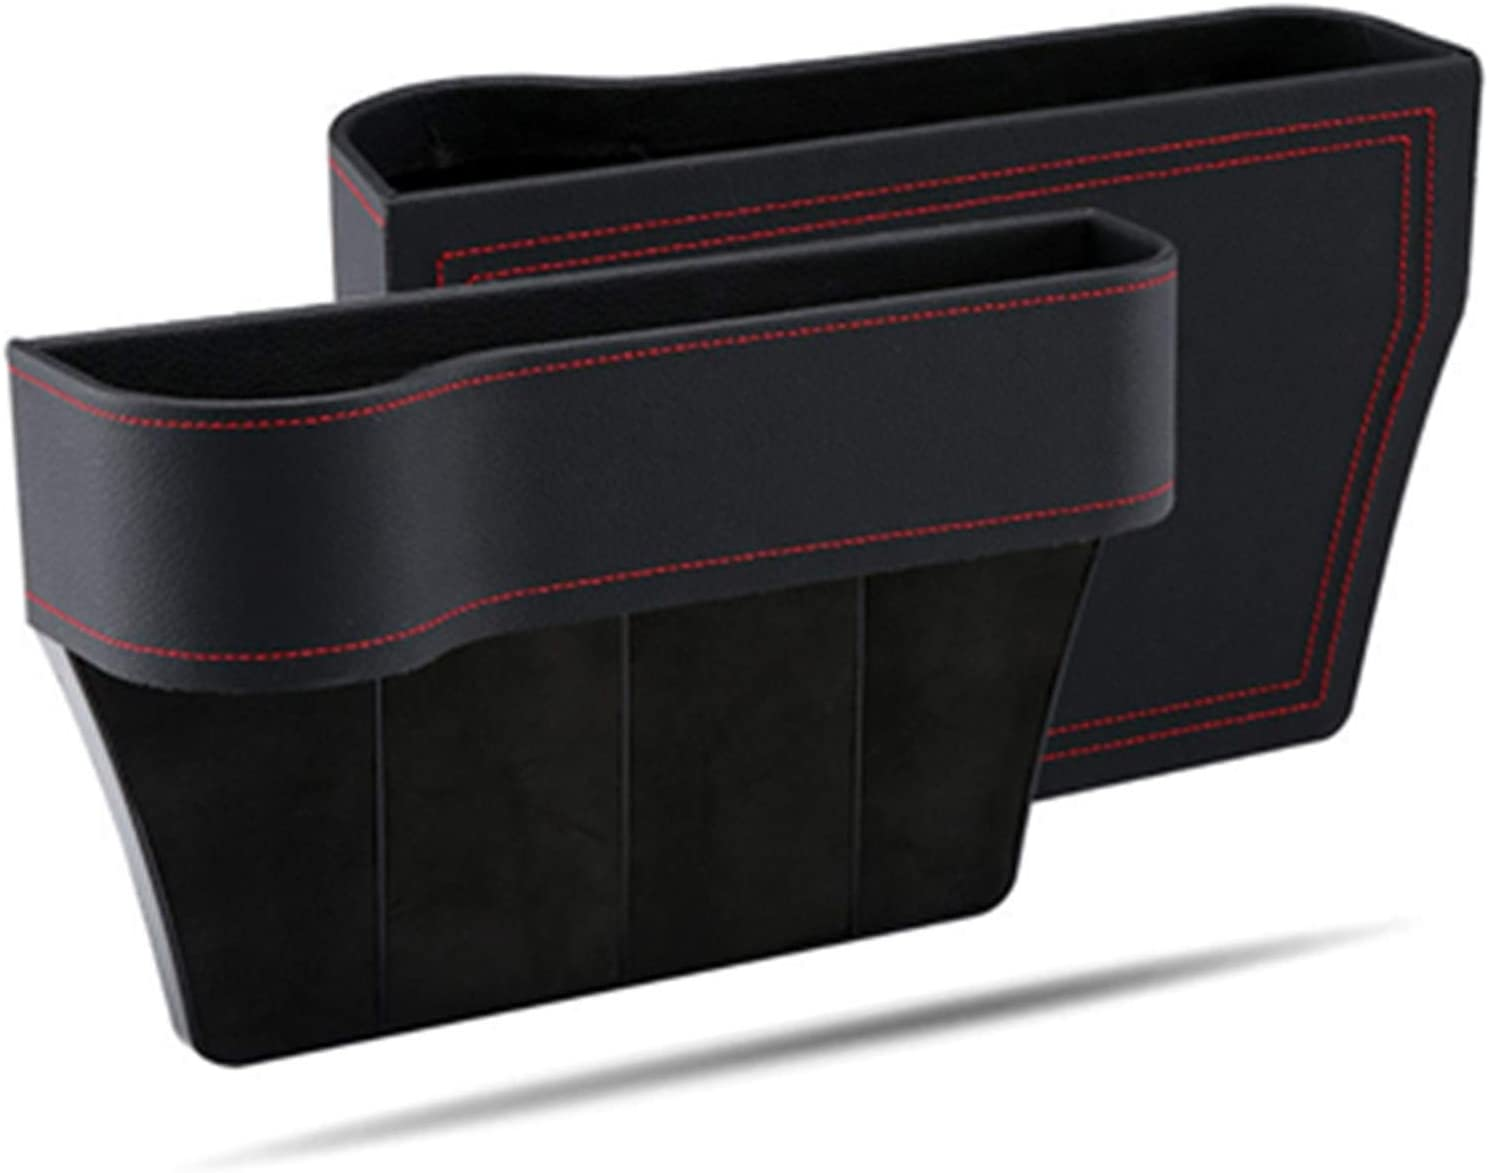 Car Storage Box Organizer Seat Gap Max 55% OFF Accessoies Kia Rio Large special price !! K Auto for